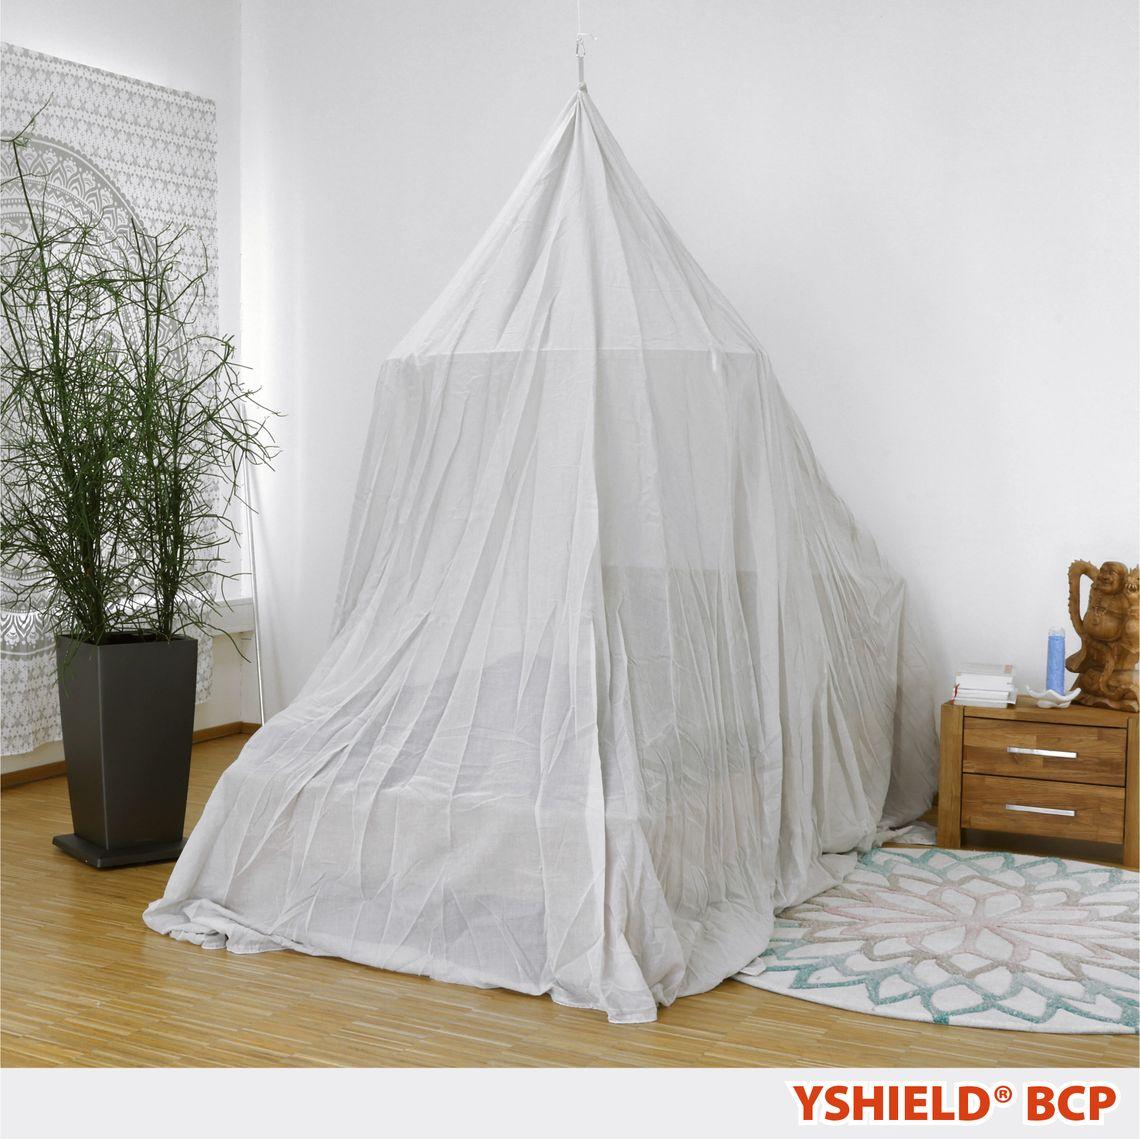 YSHIELD® BCP   Abschirmbaldachin   Pyramide   SILVER-COTTON   Miete 14 Tage